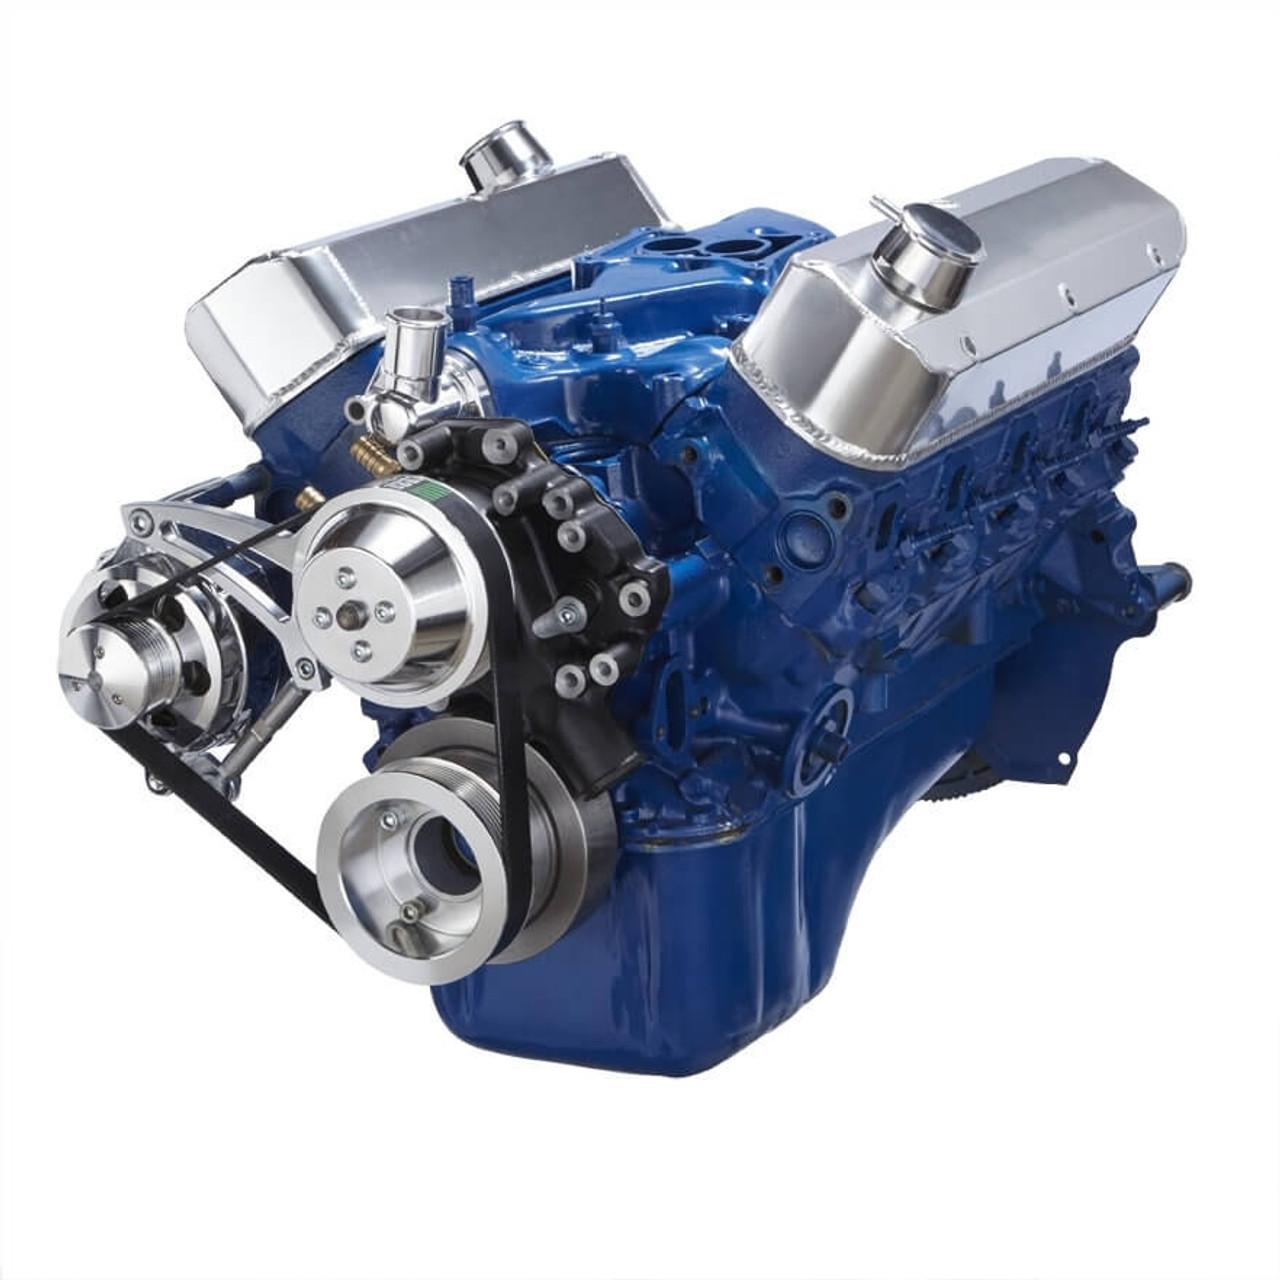 Ford Serpentine Conversion Kit Alternator 289 302 351w